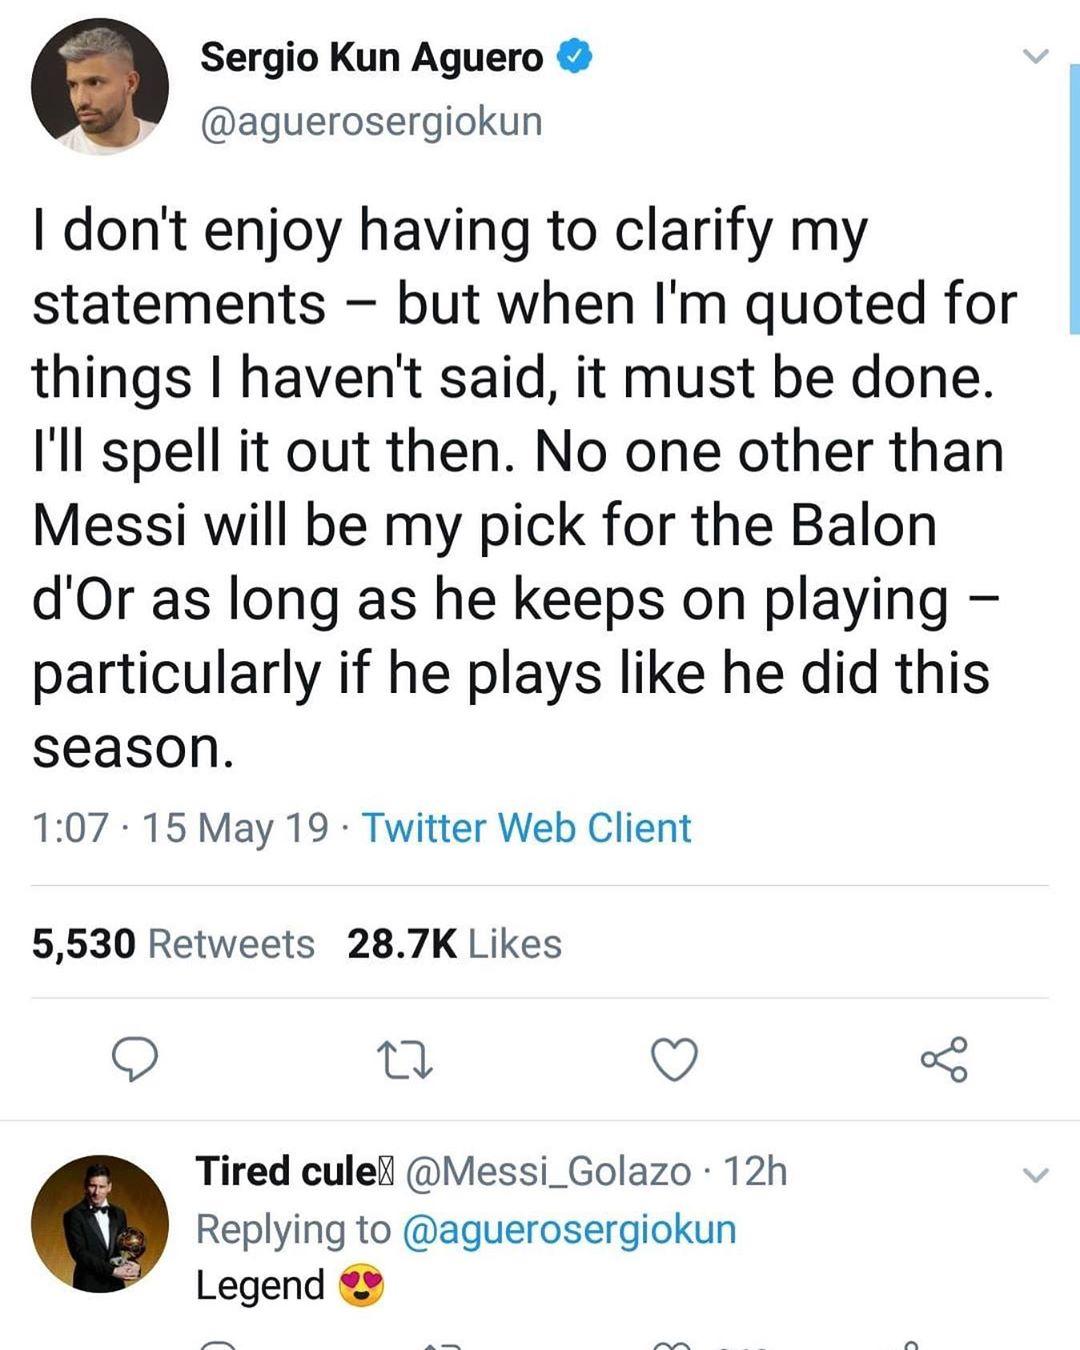 Aguero ทวีตเกี่ยวกับ Balloon D'or ทำเครื่องหมายเพื่อนเพื่อดูสิ่งนี้ @ tyler_soccer Follo …